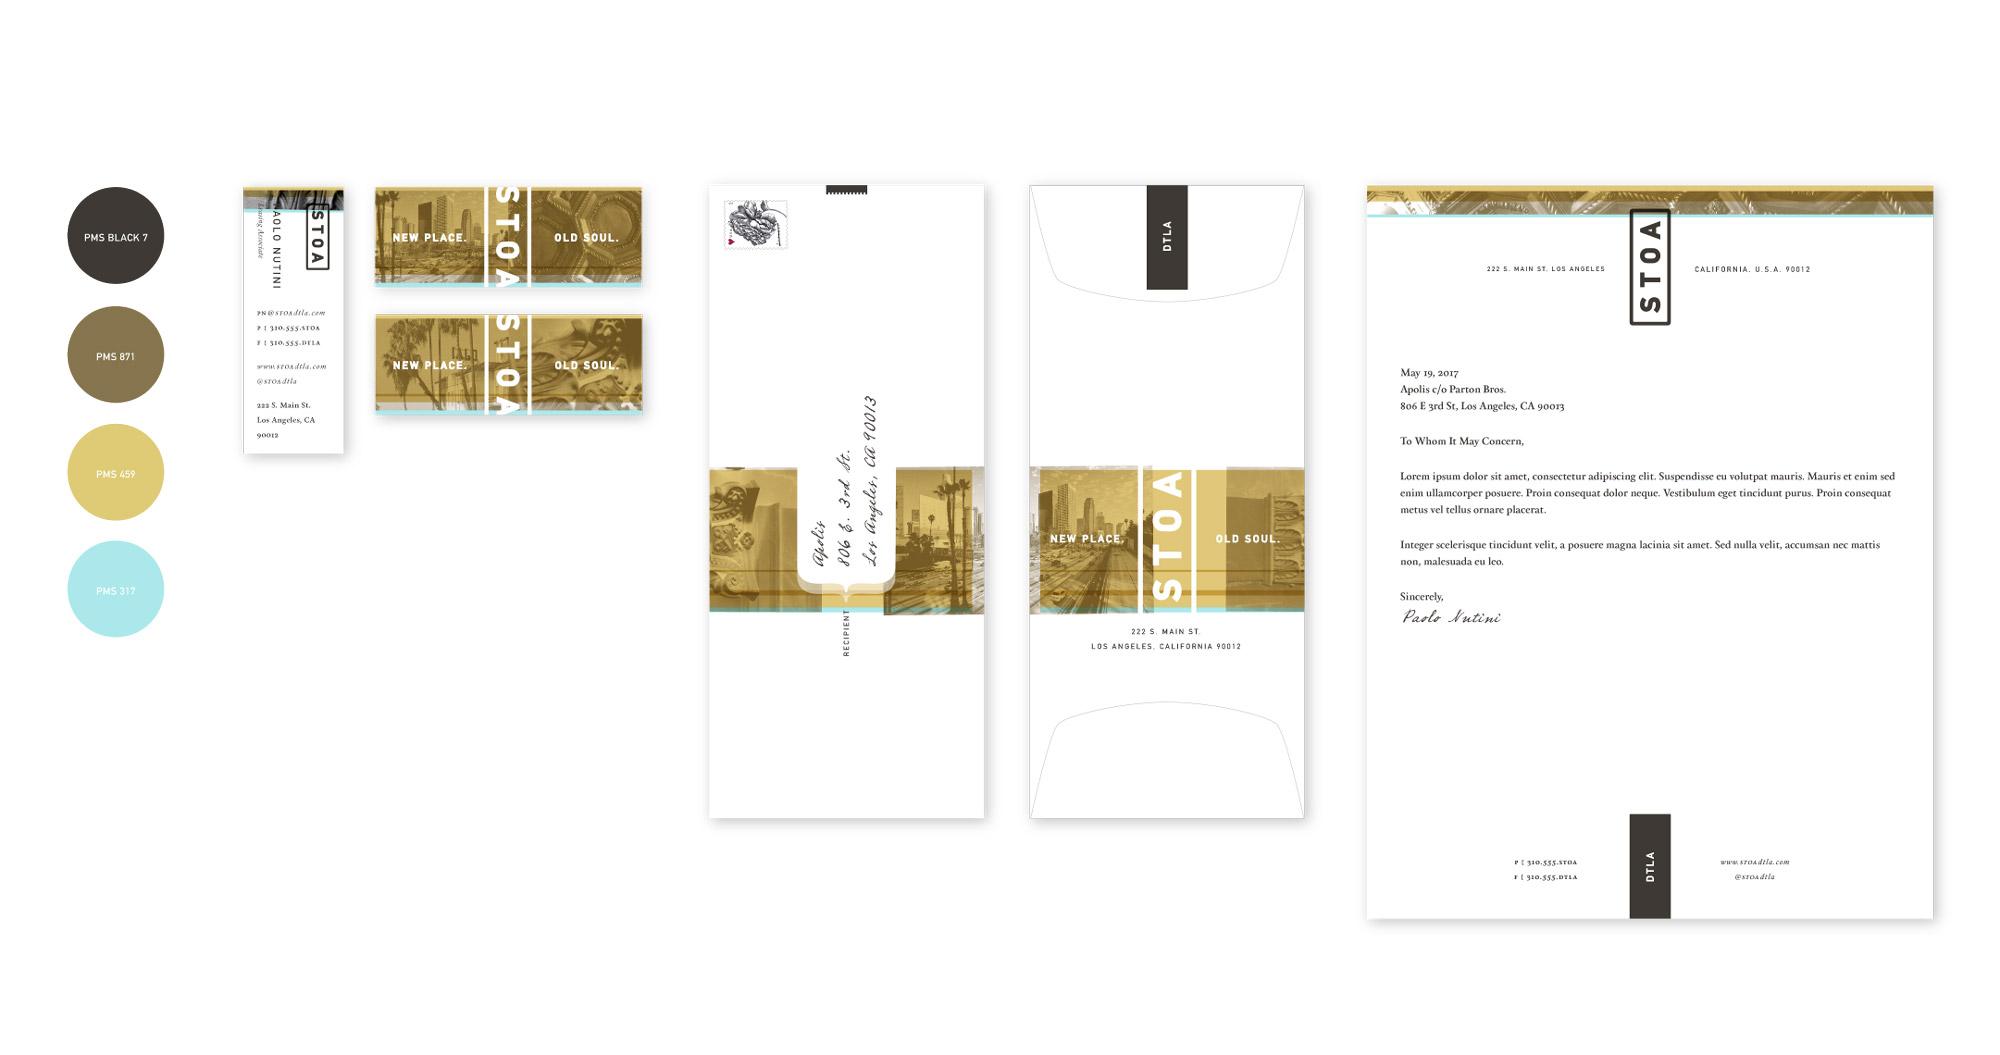 miriello-grafico_STOA-downtown-los-angeles-apartment-branding-12.jpg